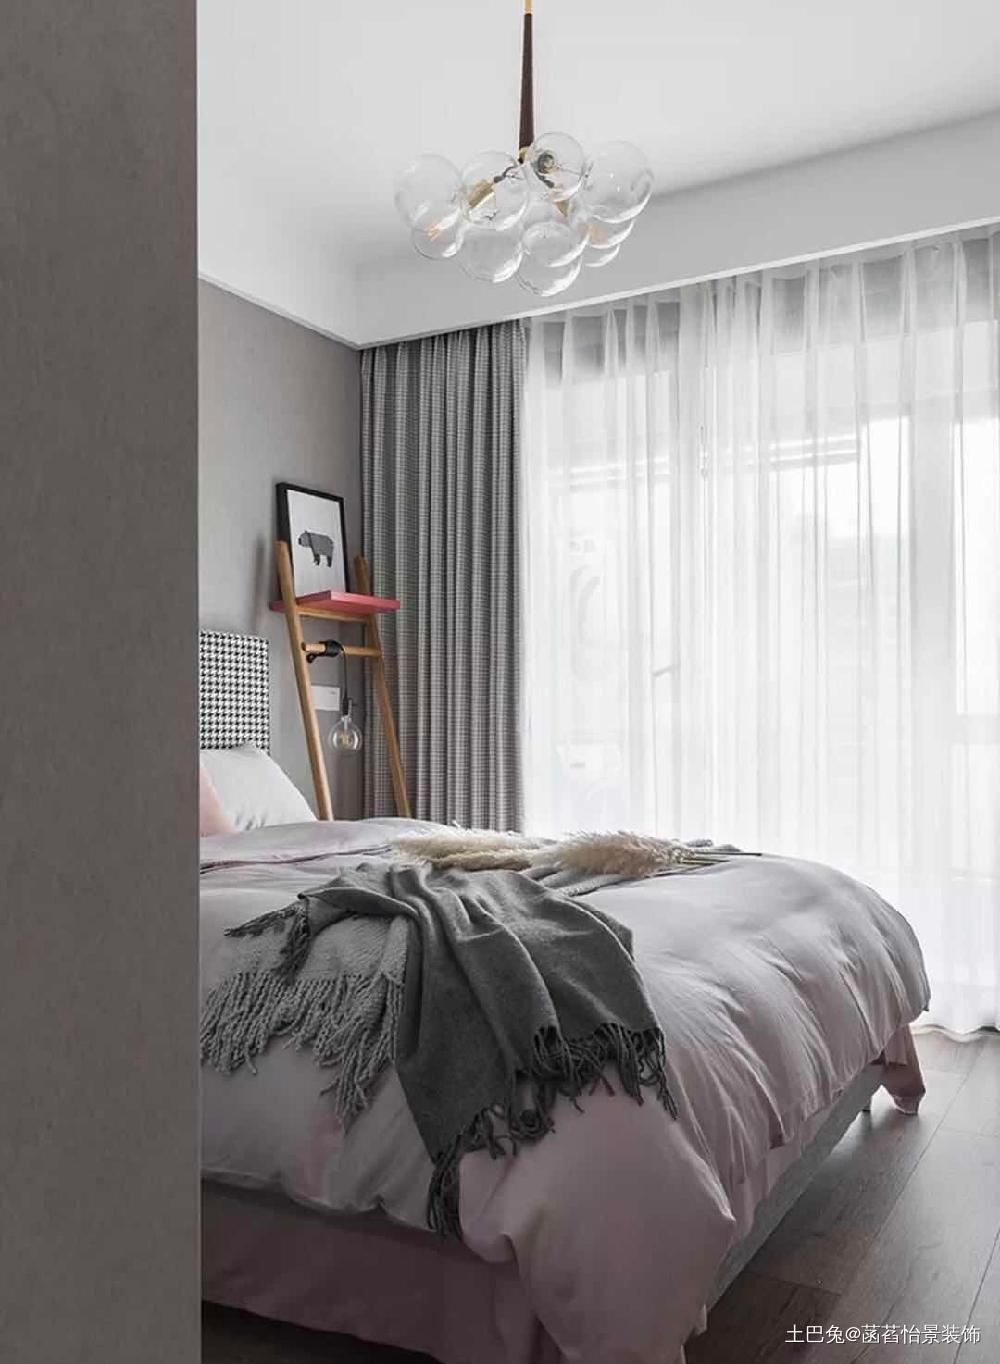 It年轻小夫妻的家阳台变身书房卧室其他卧室设计图片赏析